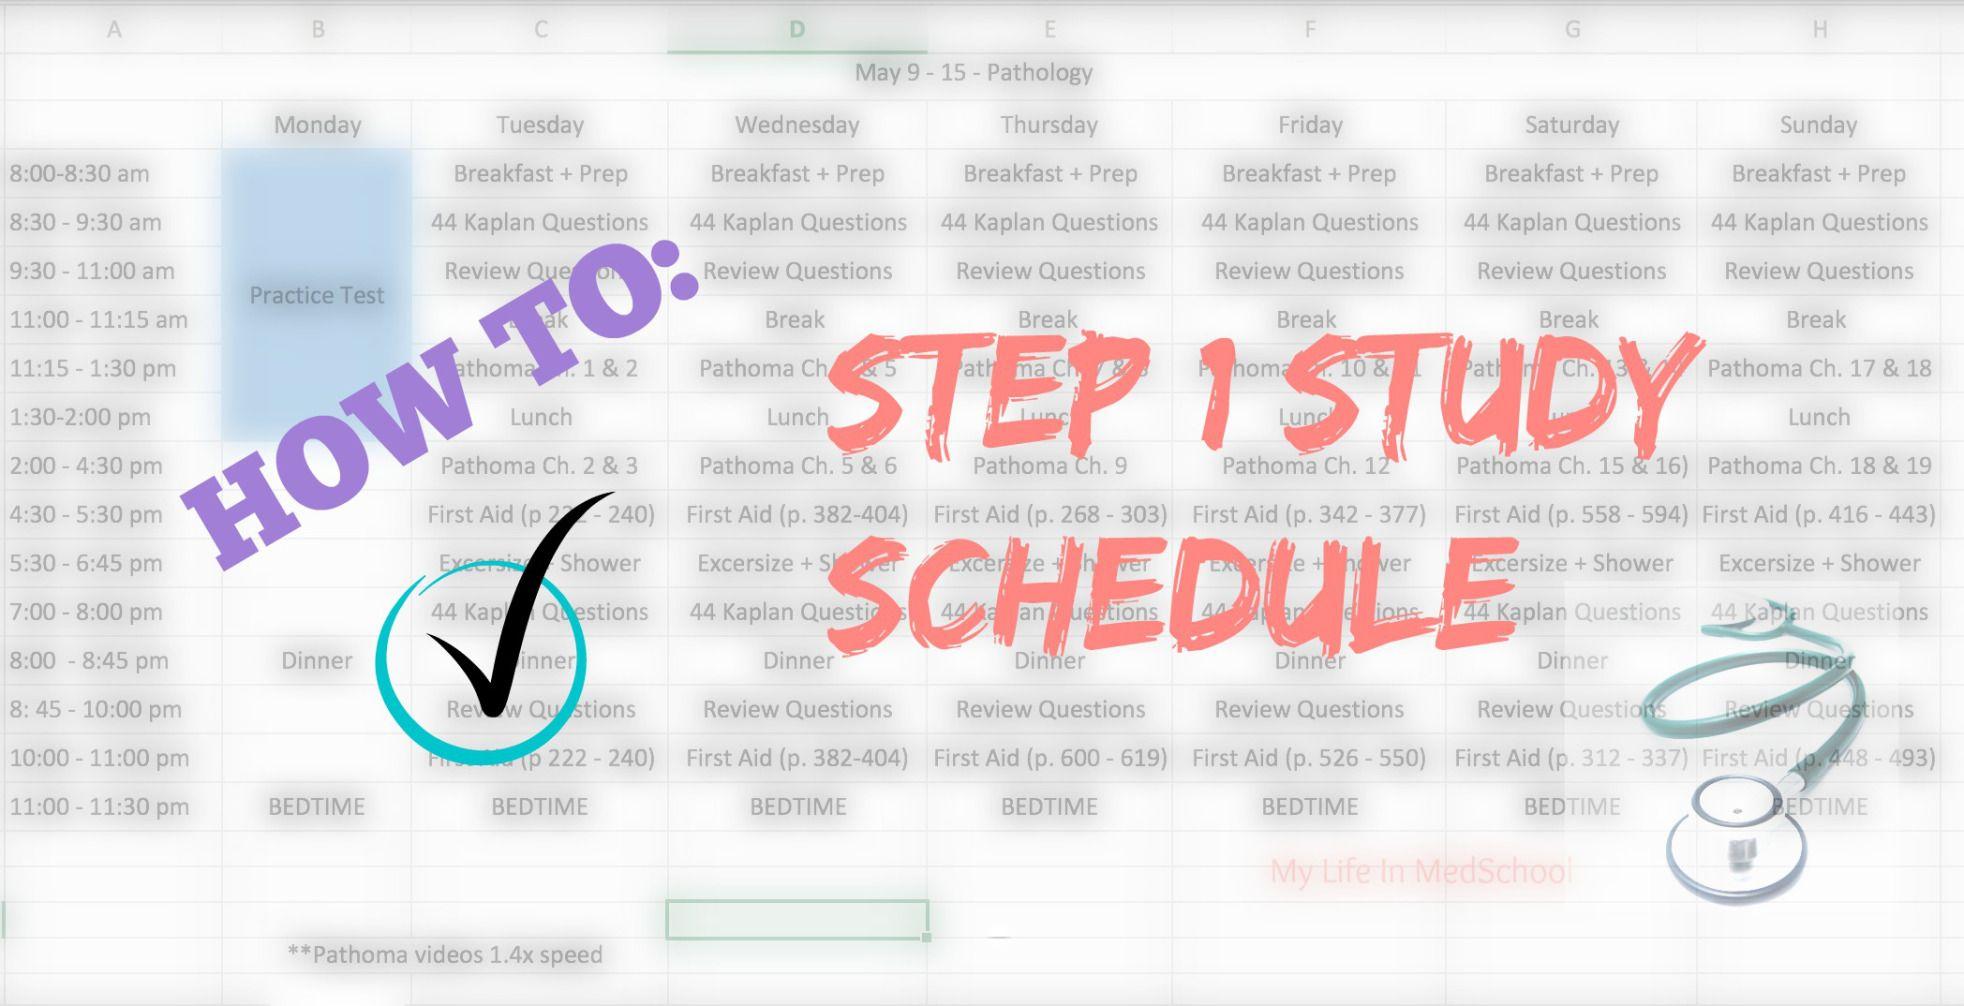 Scheduling 2 Usmle Step